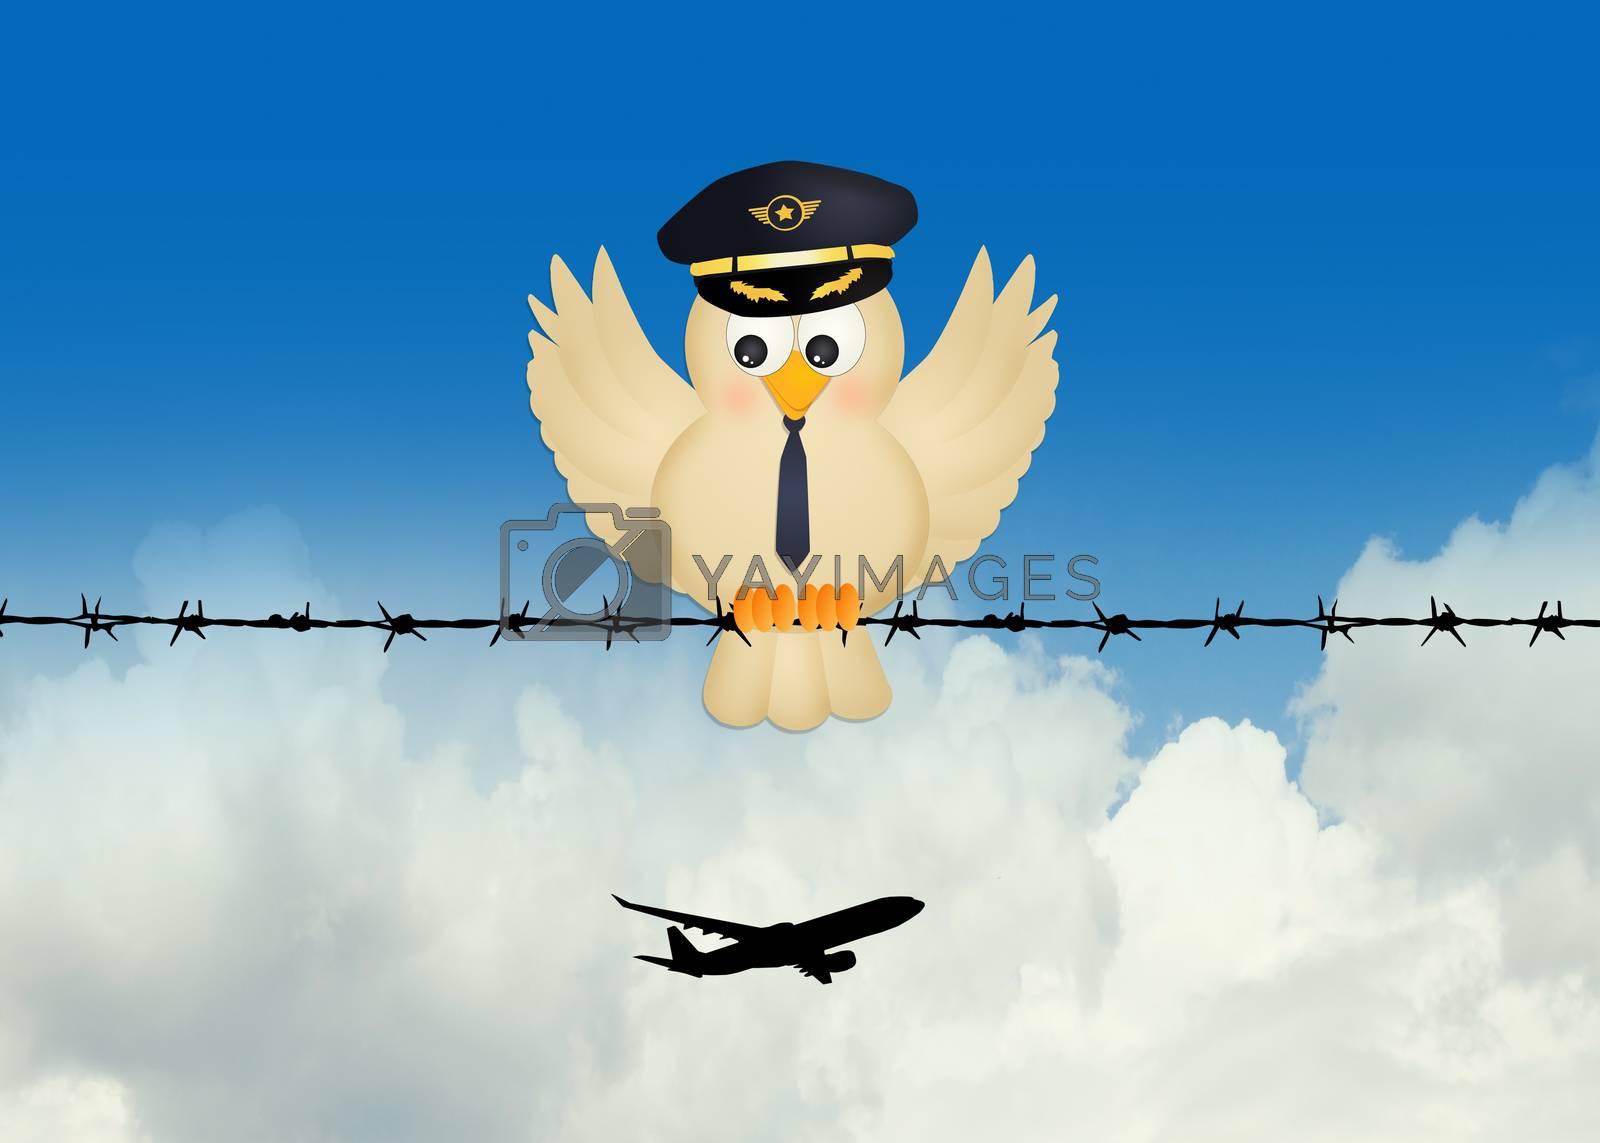 illustration of pilot bird on wire